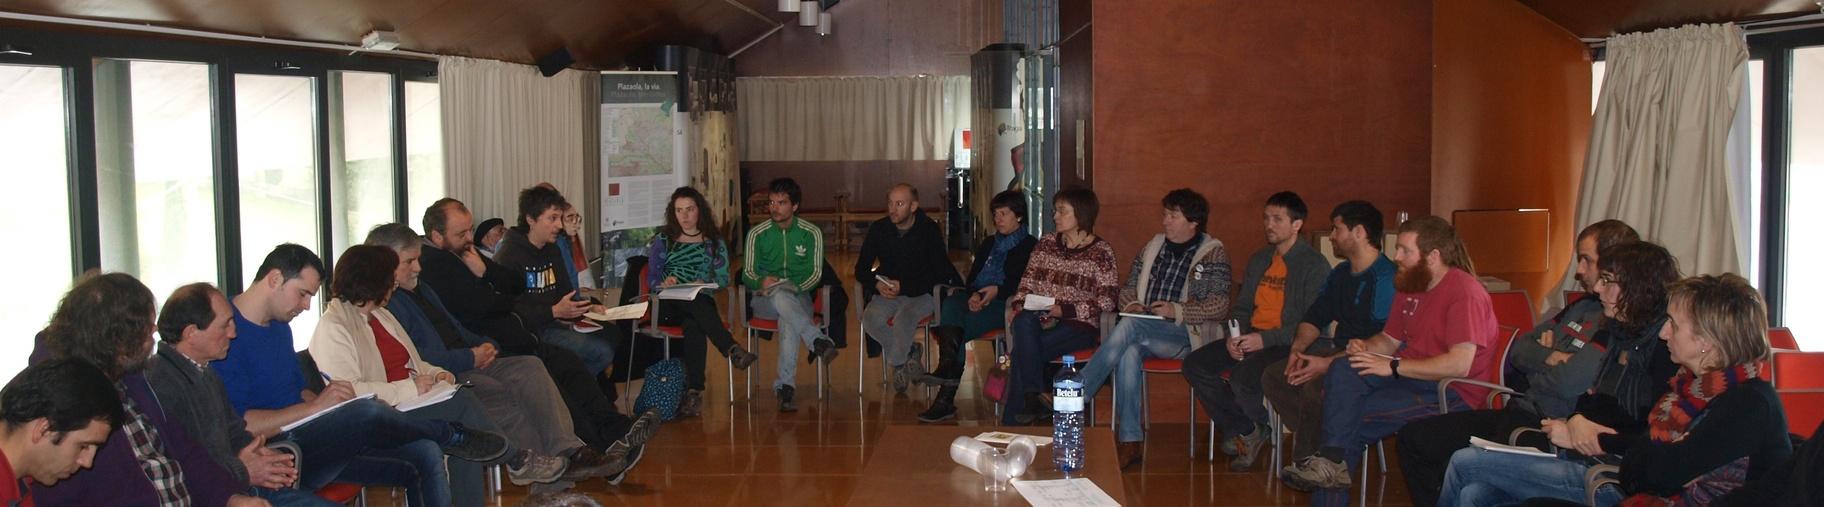 Foto del encuentro